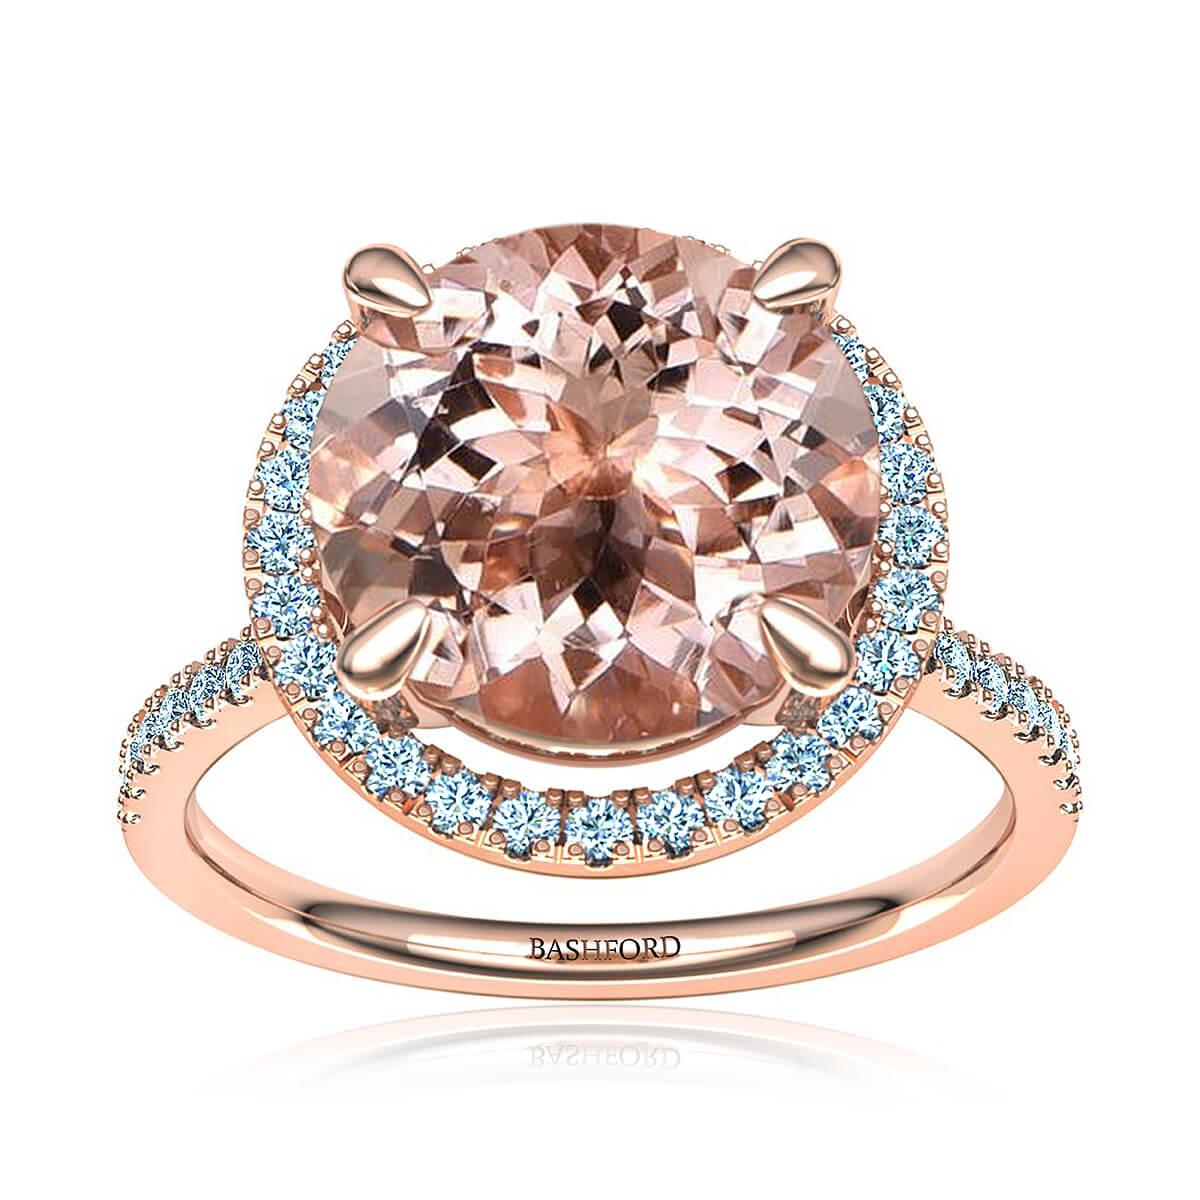 Rosalyn Morganite Ring (with 4 1/4 Carat Round Morganite)